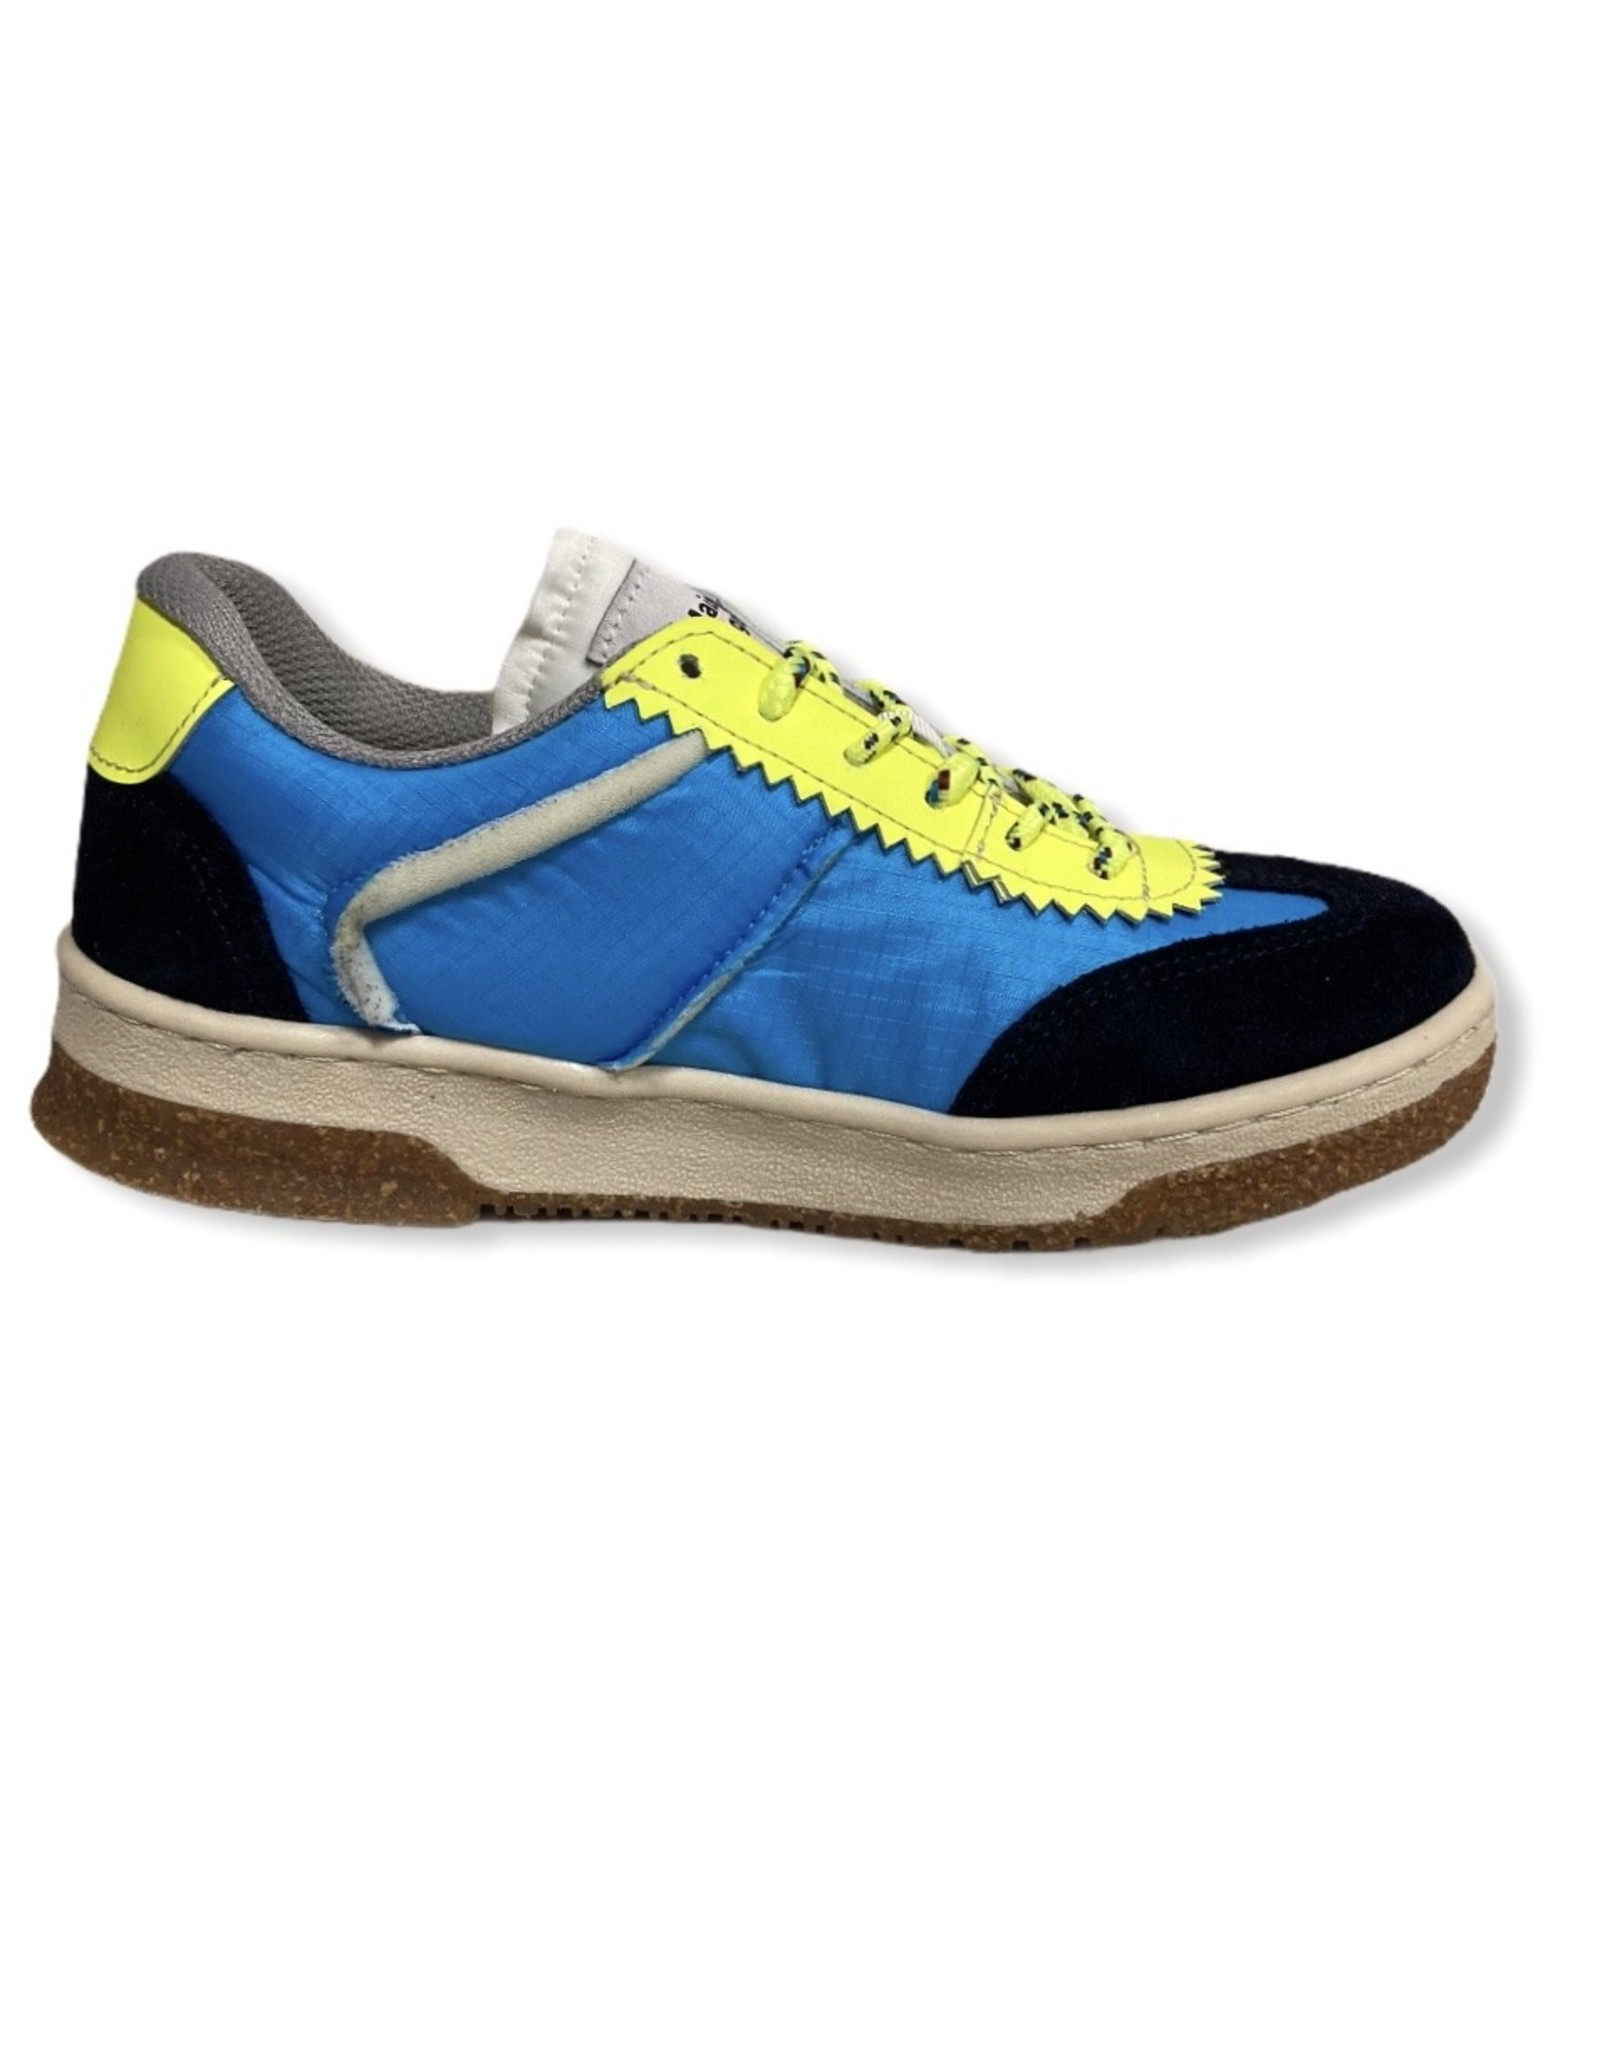 Maison Mangostan Maison Mangostan Grosella sneaker